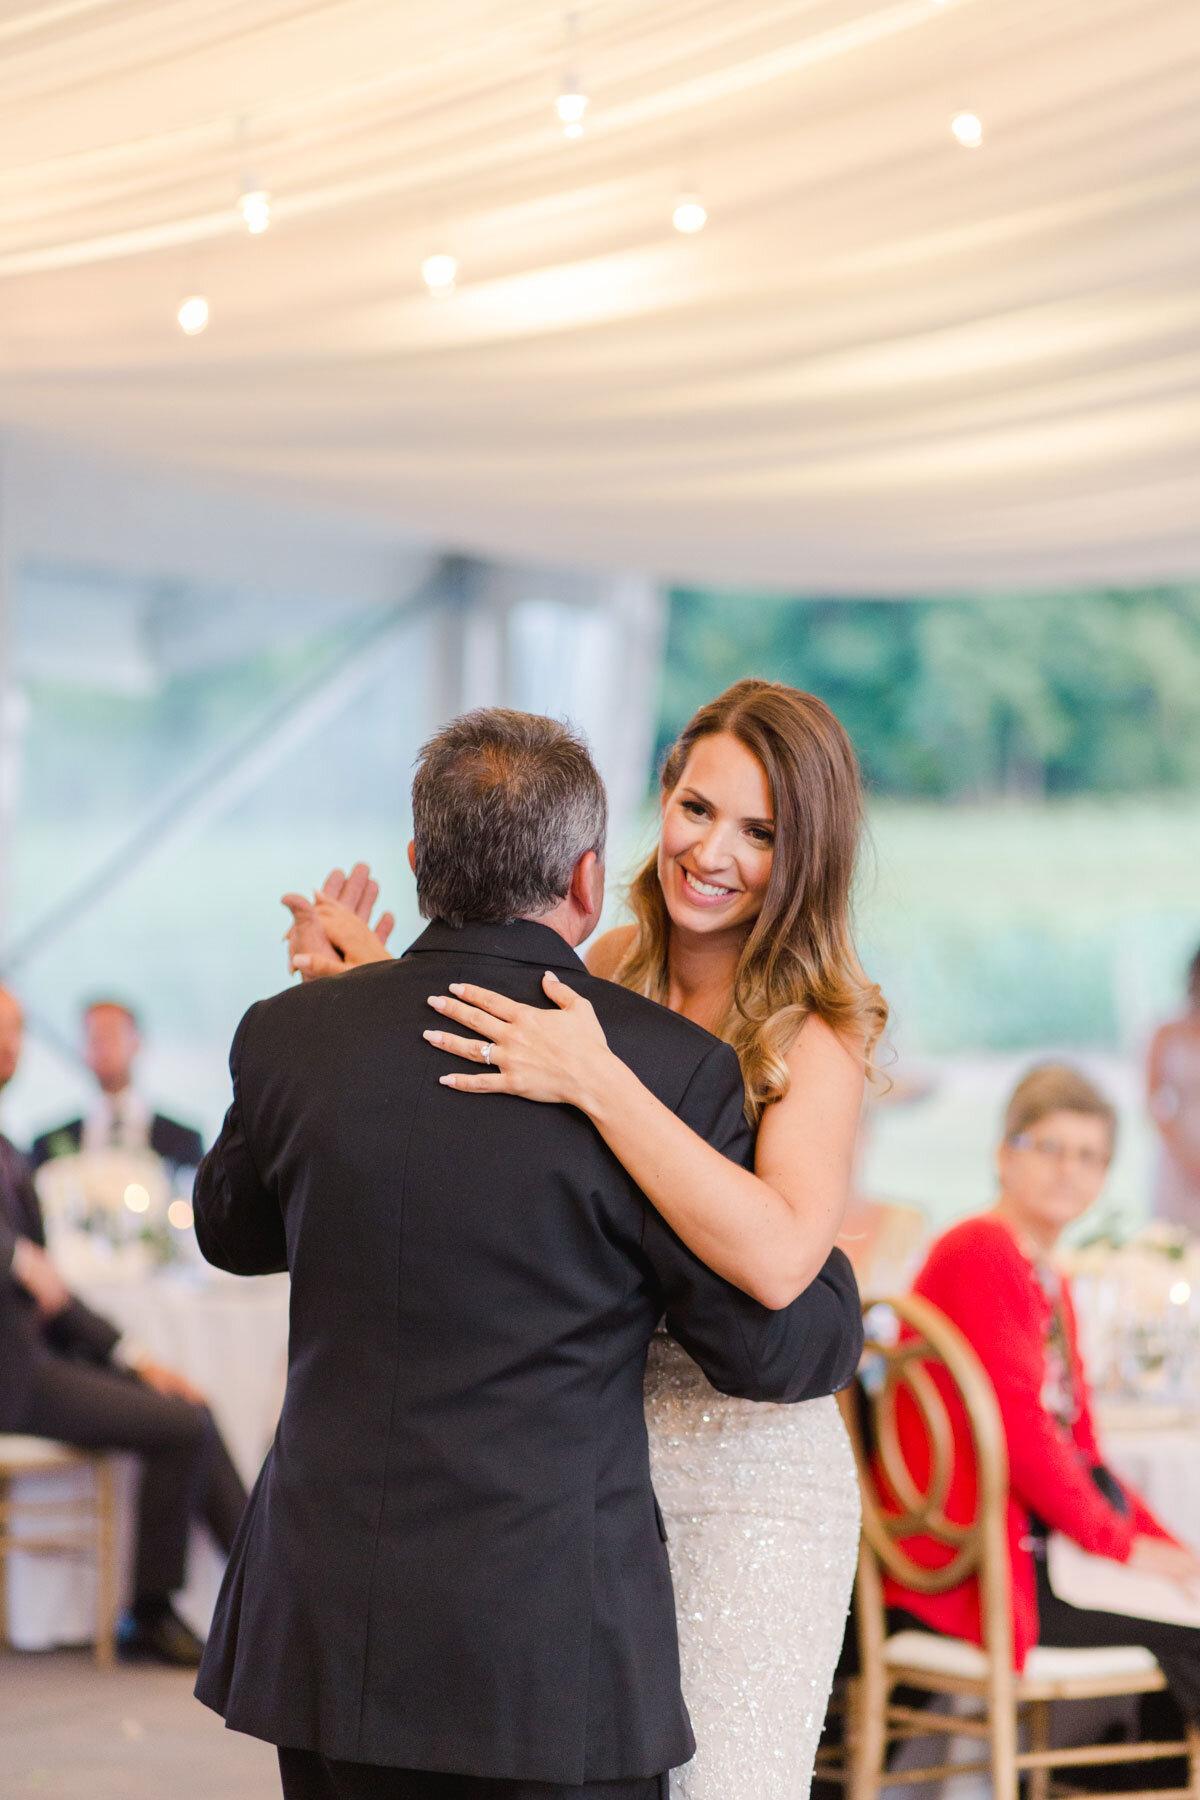 Chateau-des-Charmes-Wedding-Summer-Vineyard-Bride-Niagara-on-the-Lake-photos-by-Gemini-Photography-Ontario-0083.jpg